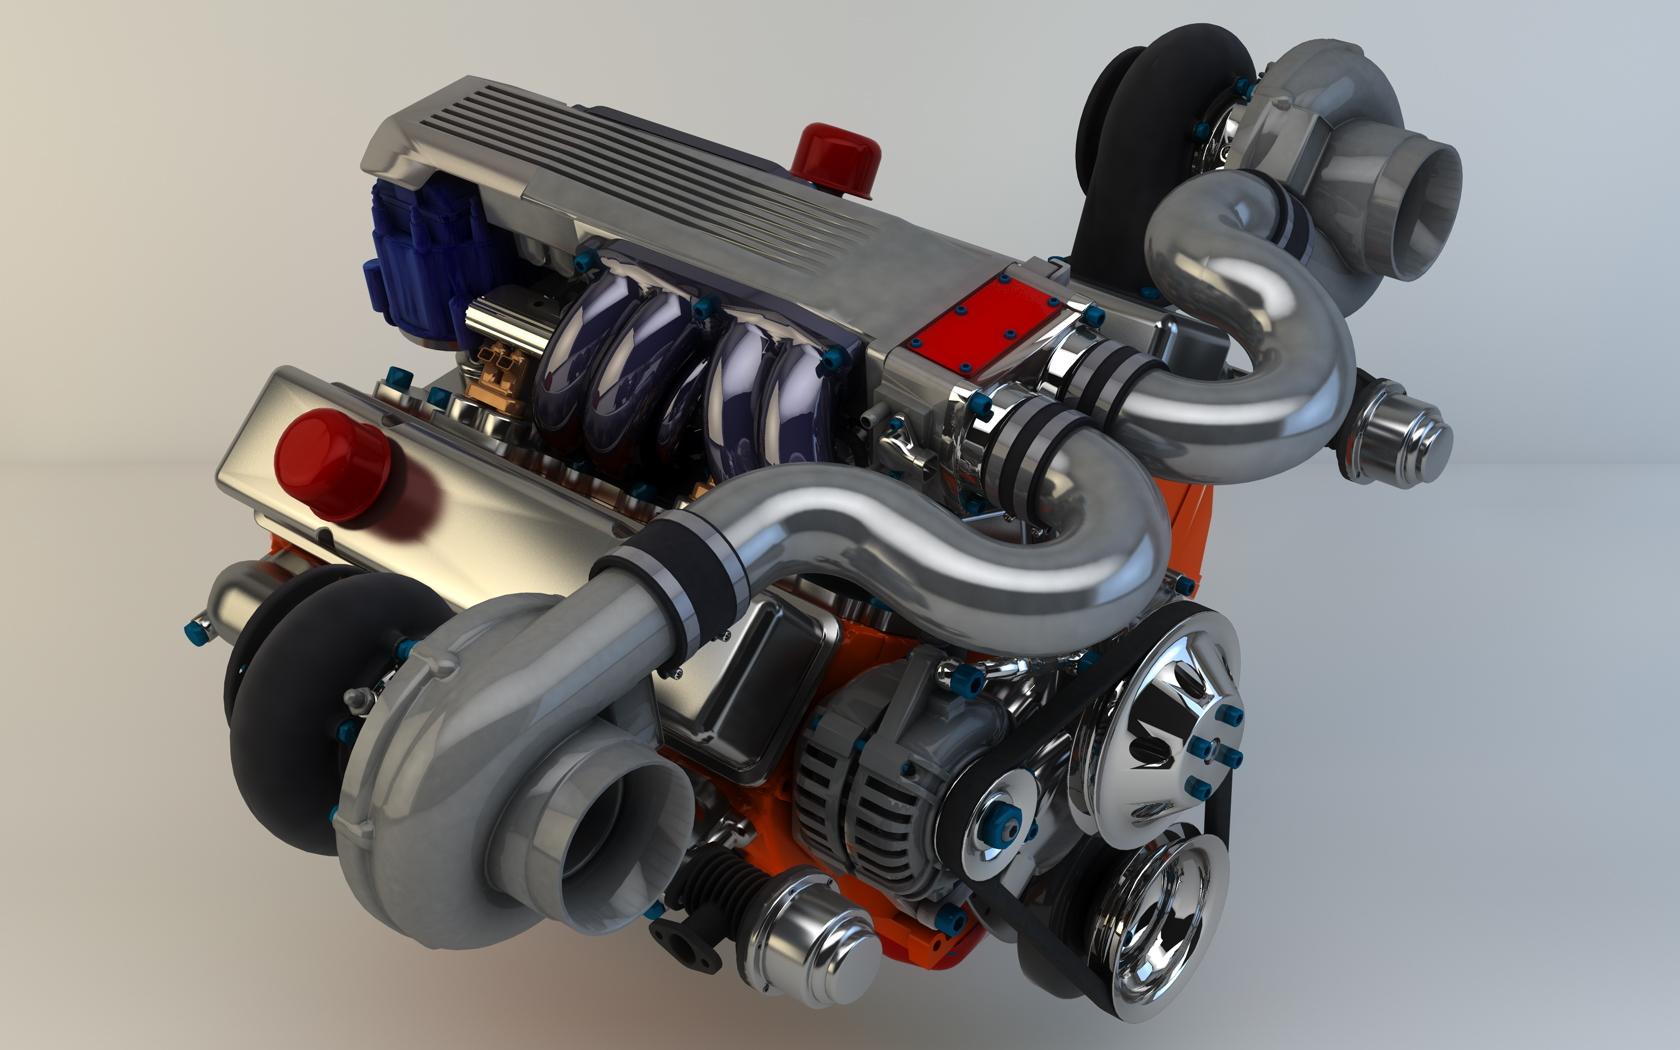 Как собрать турбо мотор на ВАЗ. DRIVE 2 67